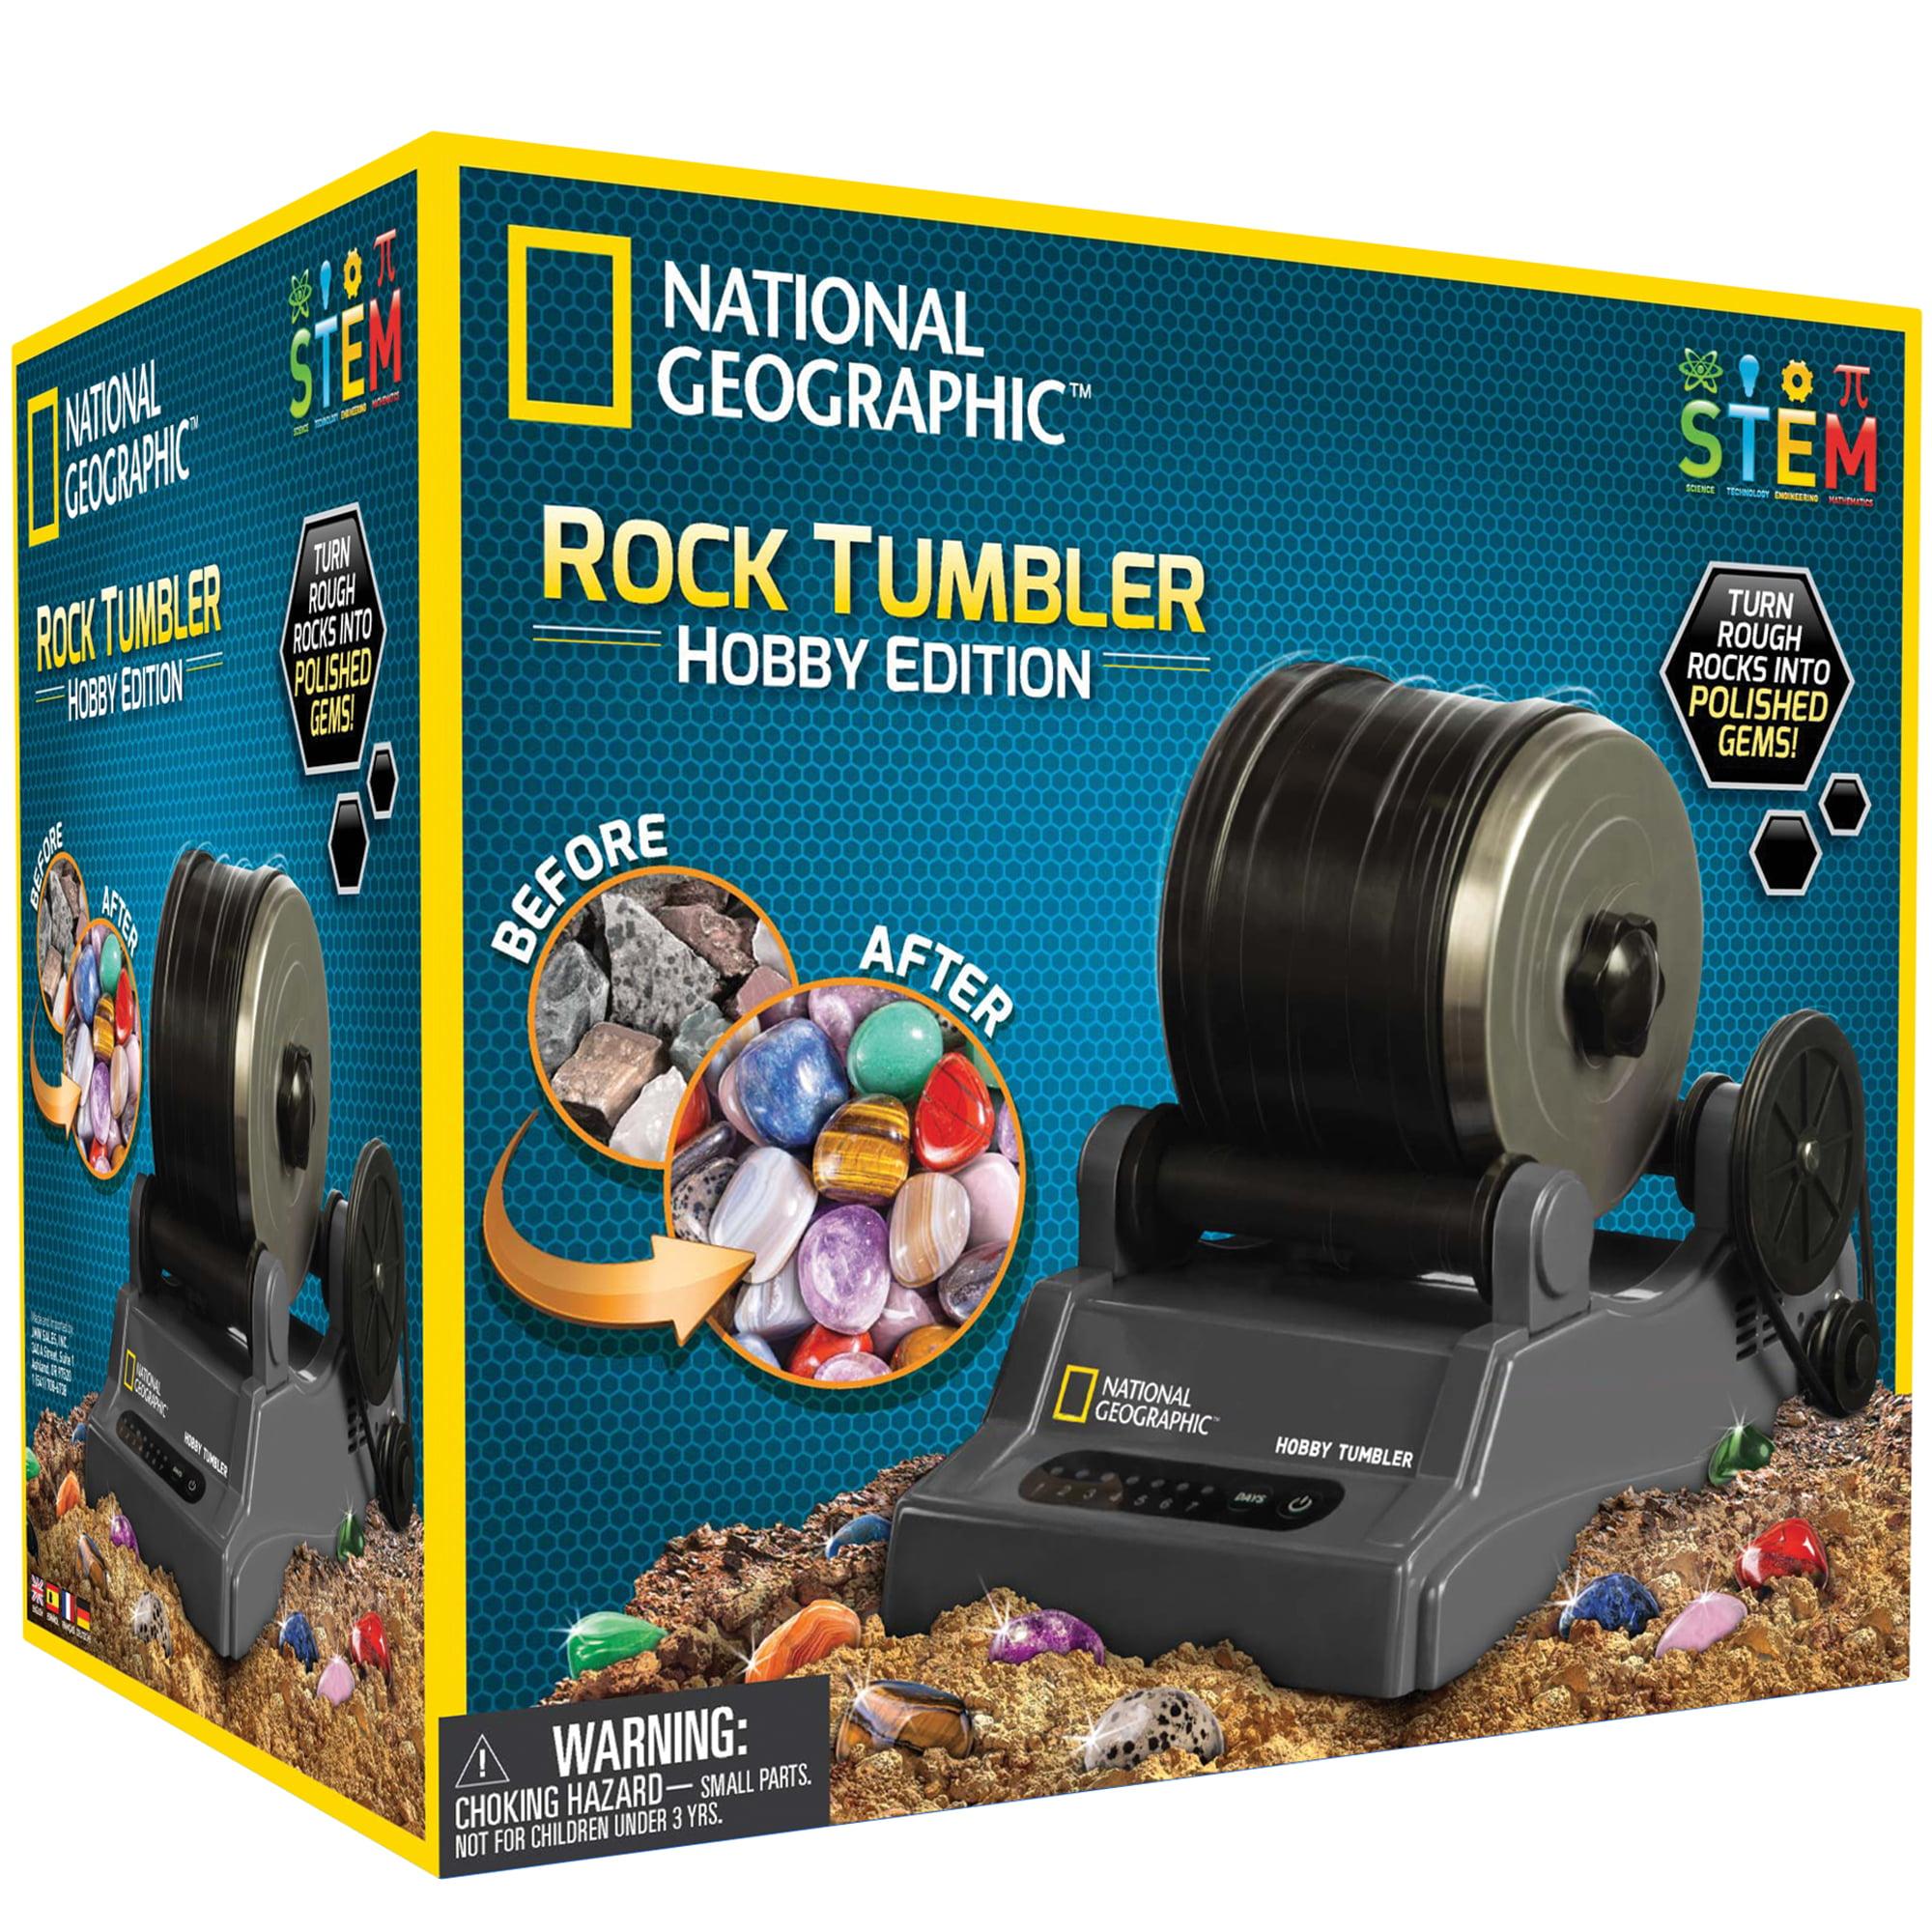 National Geographic Hobby Rock Tumbler Easily Create Polished